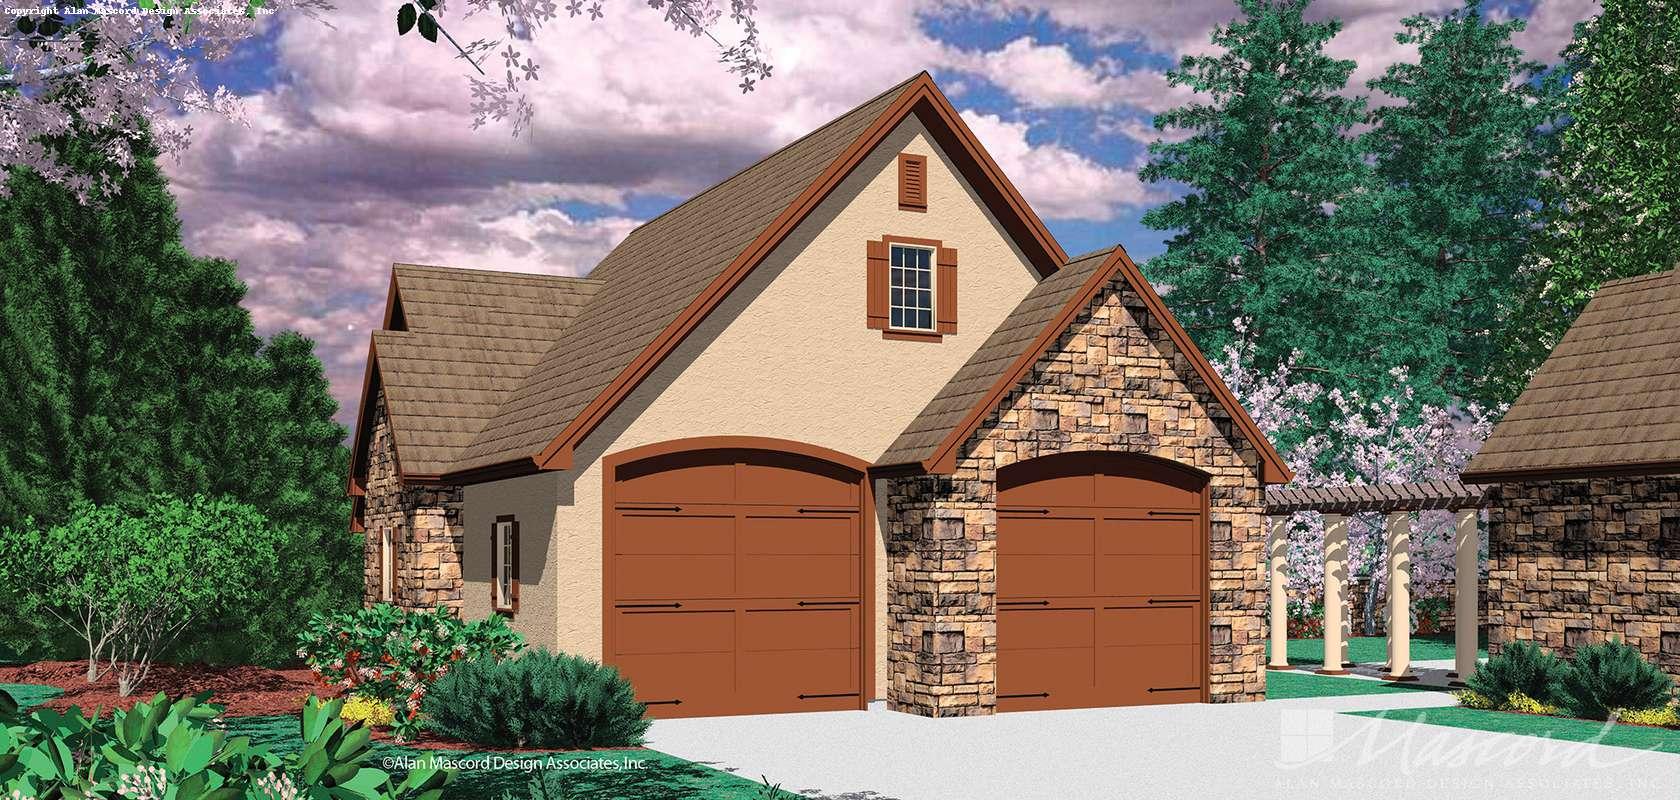 Mascord House Plan 5019: The Pocono